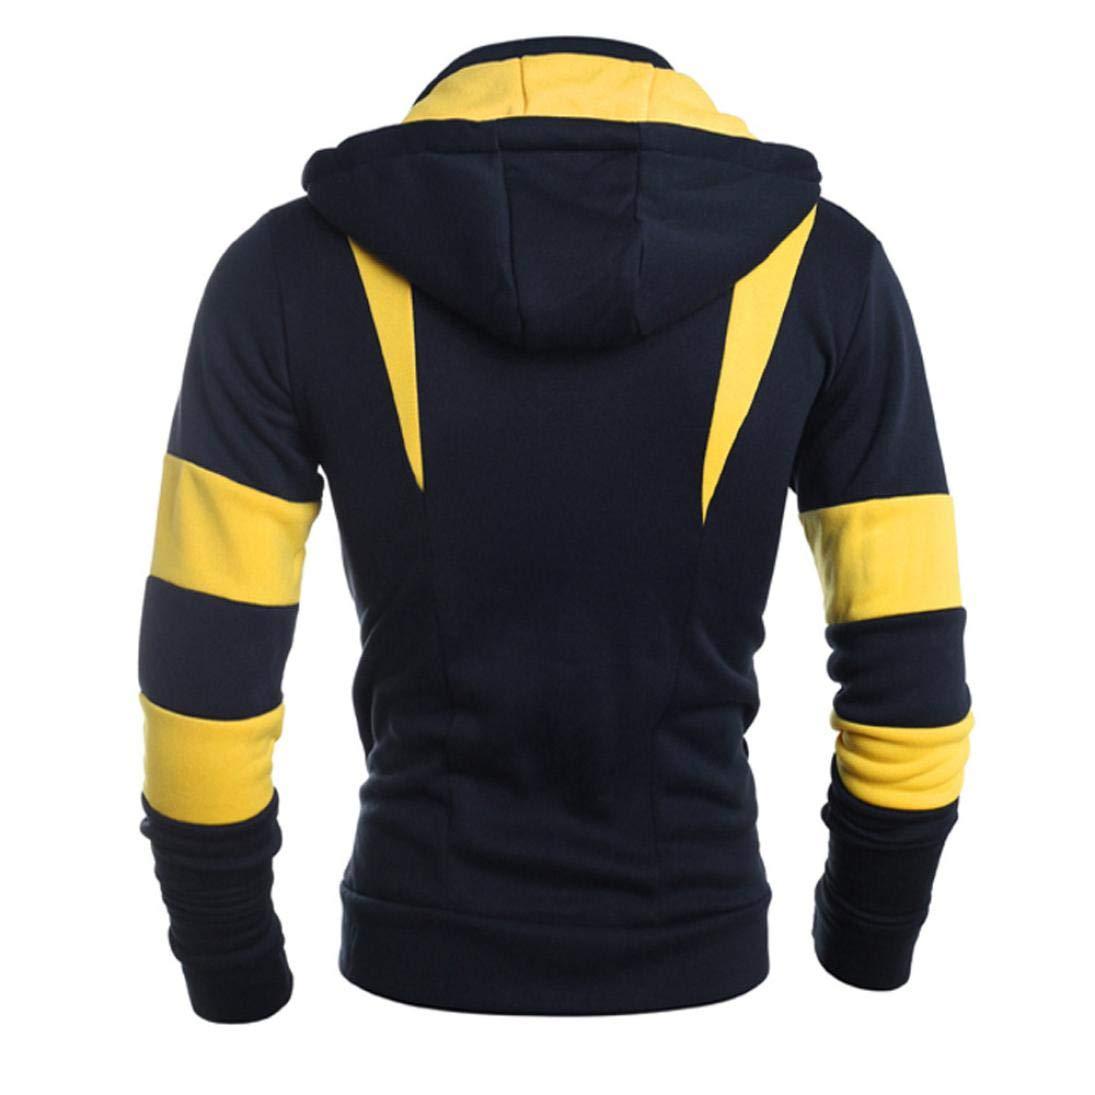 Danhjin Retro Long Sleeve Hoodie Hooded Patchwork Sweatshirt Tops Men Jacket Coat Outwear Outdoor Pullover (Yellow, XXL) by Danhjin (Image #3)